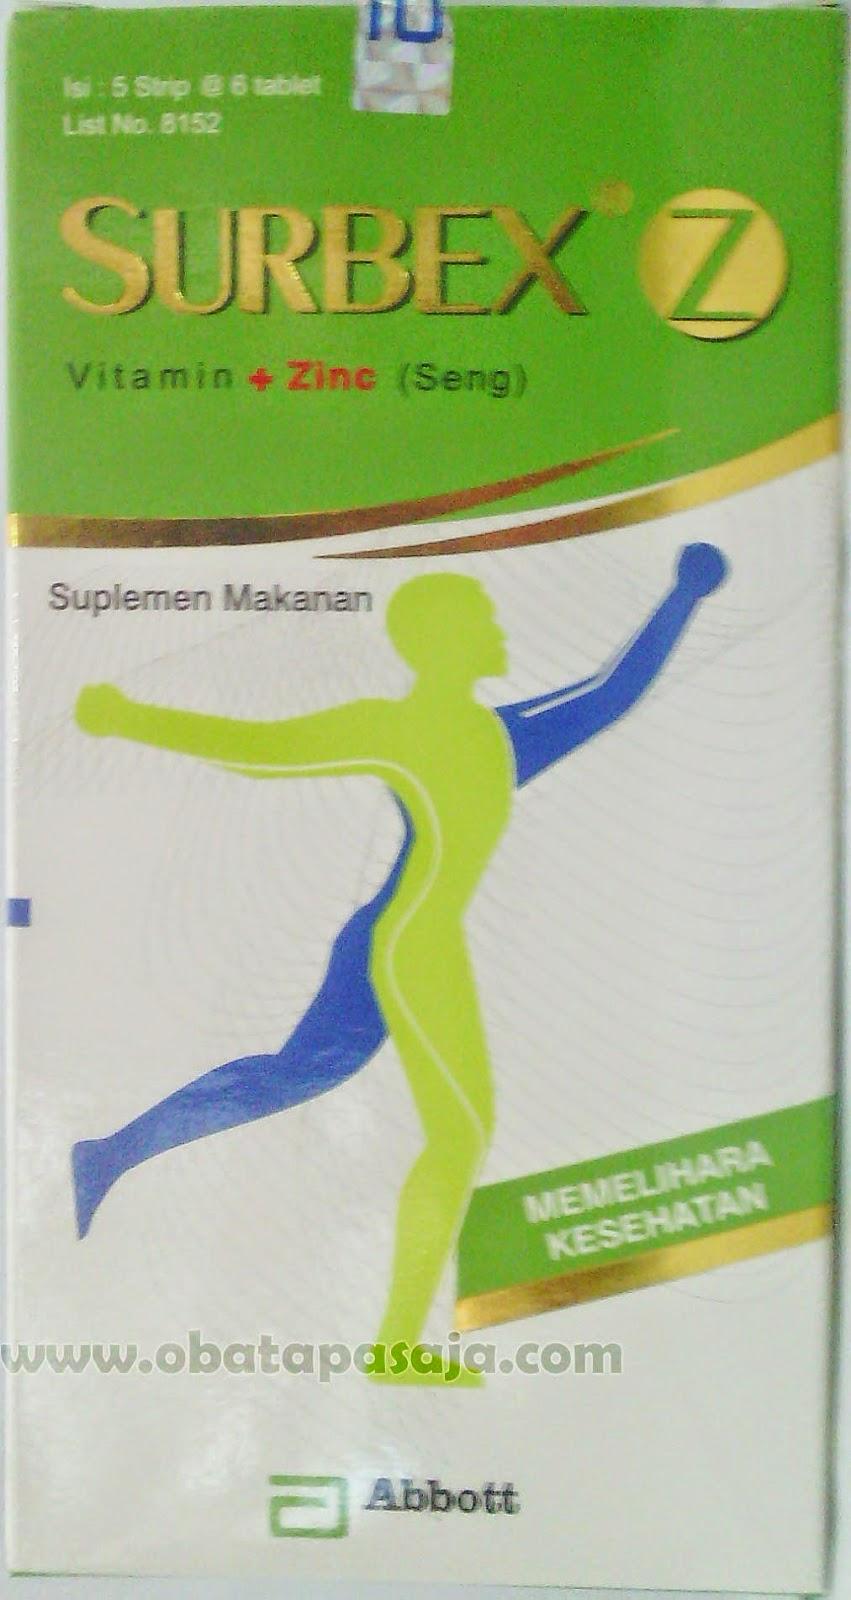 Komposisi dan Harga Surbex Z Vitamin + Zinc (Seng)